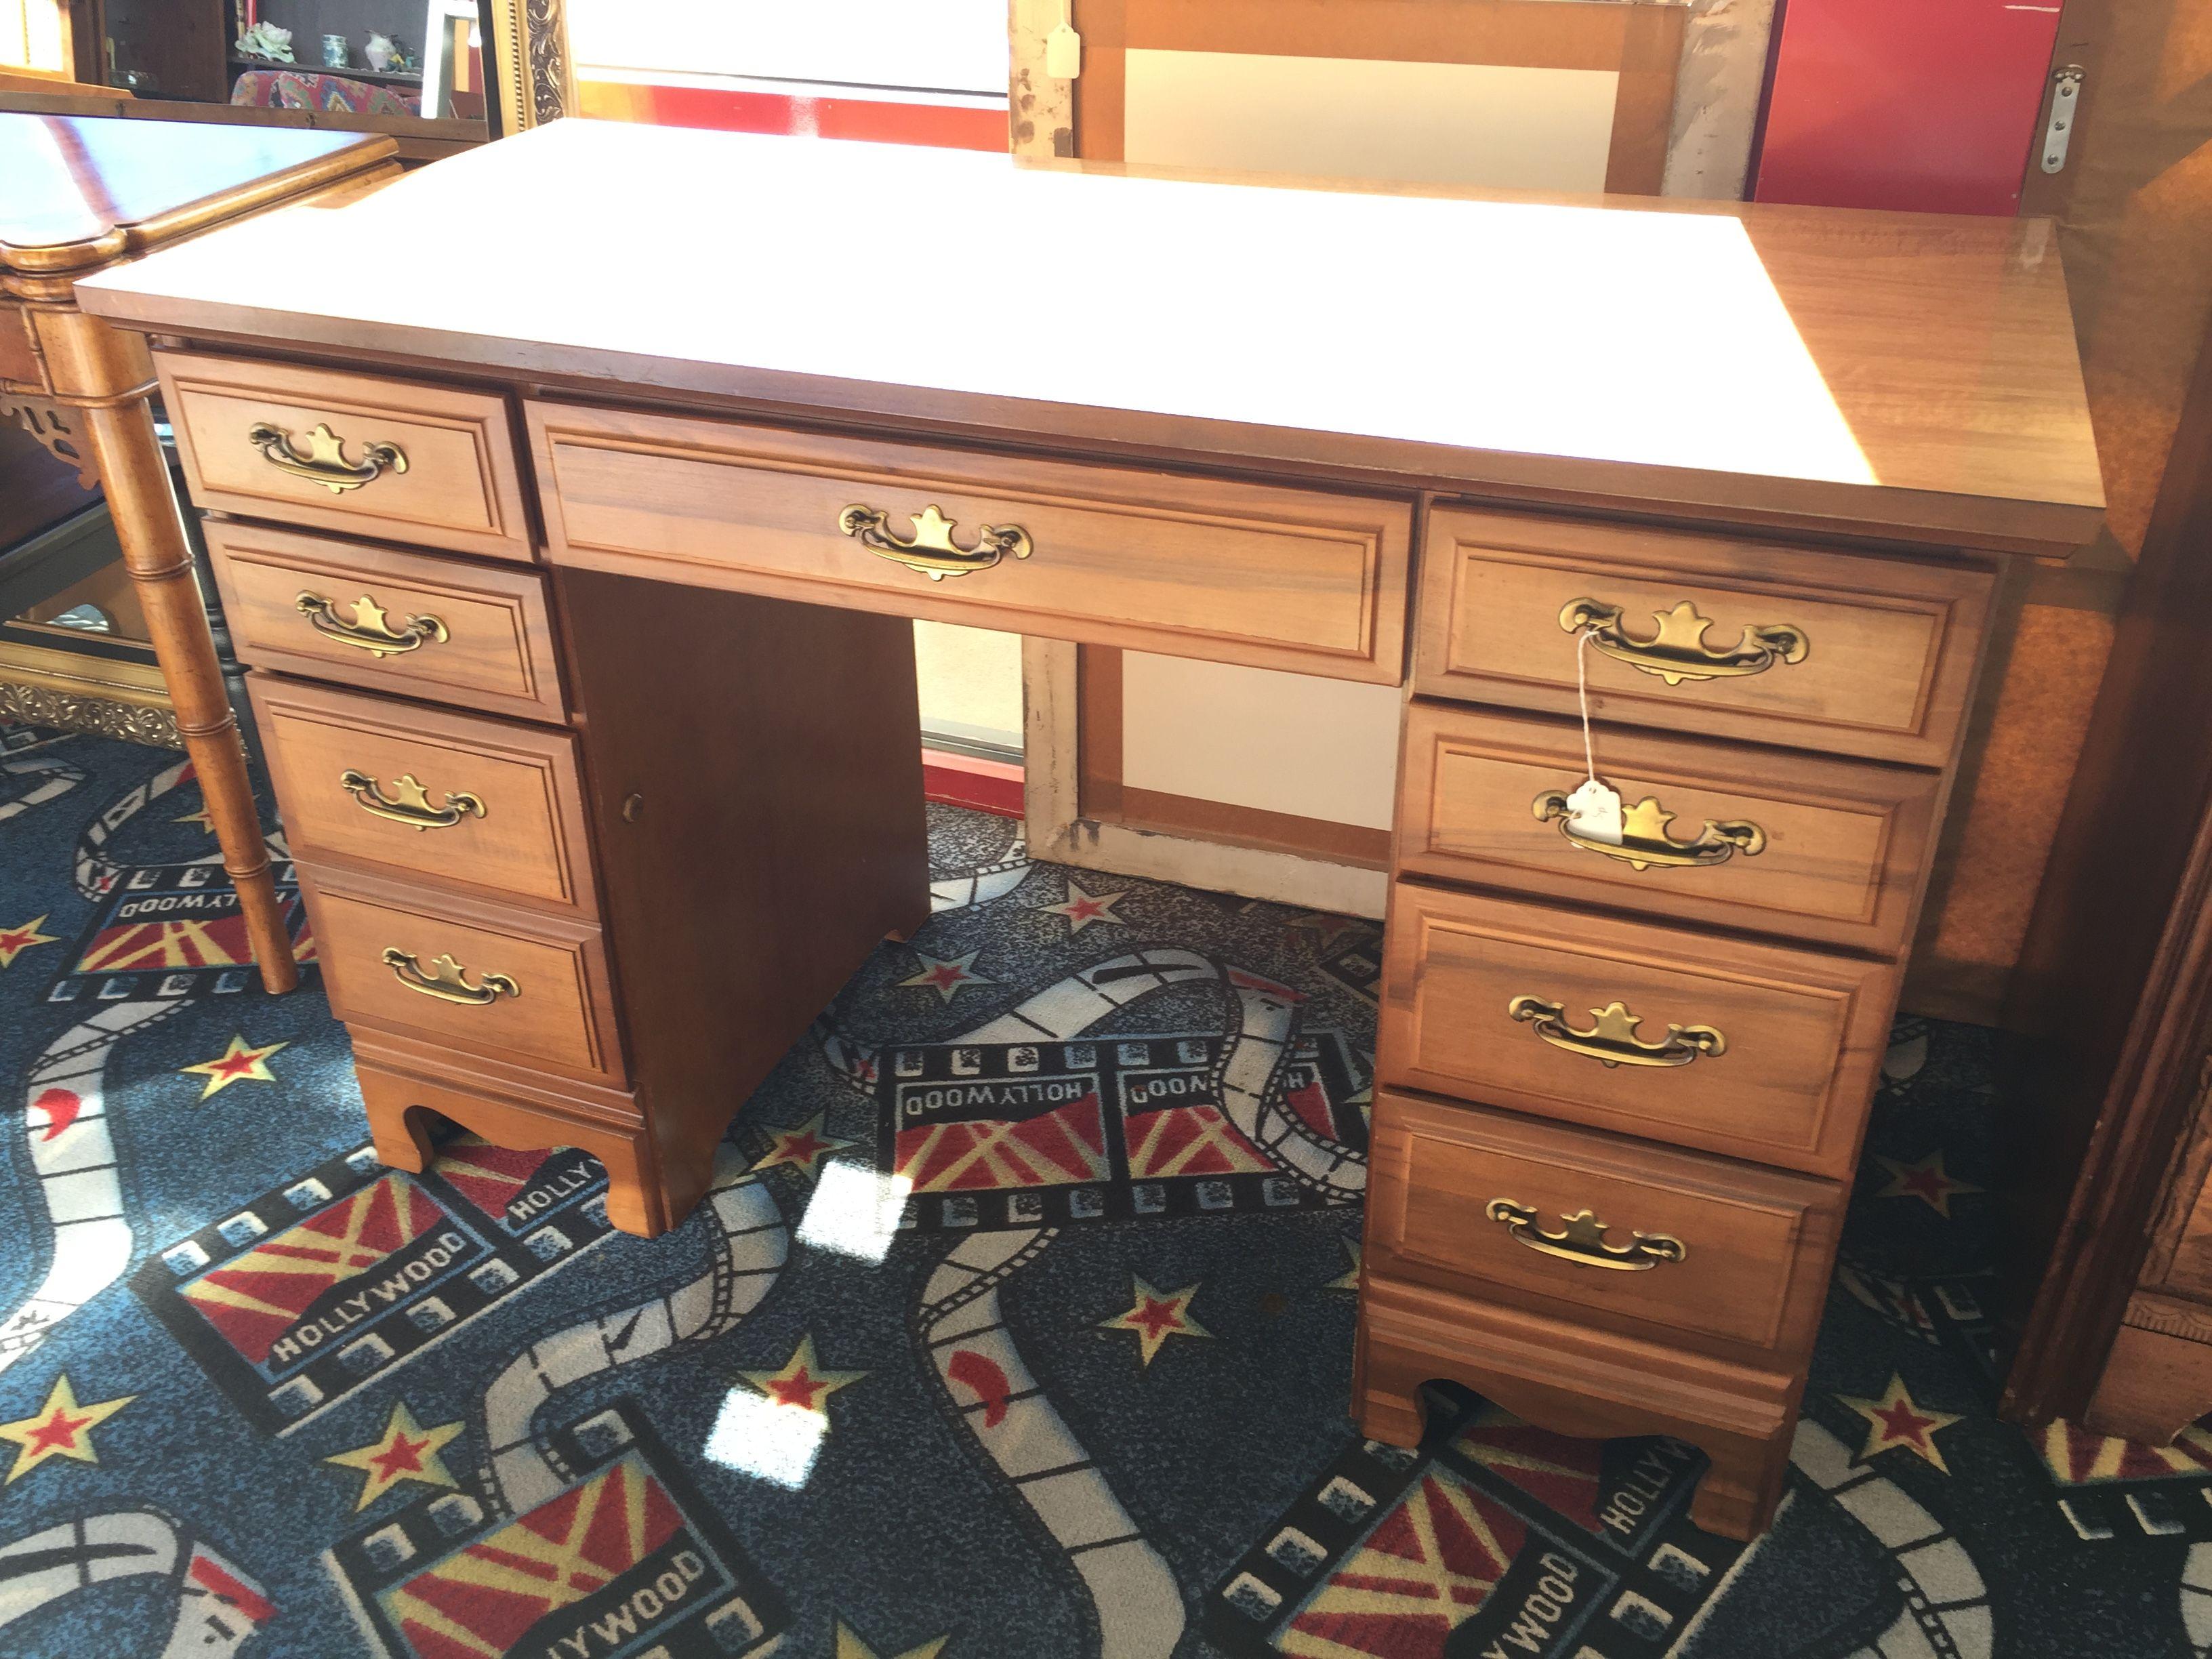 small desk 150 great for dorms or small bedrooms desk work rh pinterest com Bedroom Tables Desks Bedroom Tables Desks